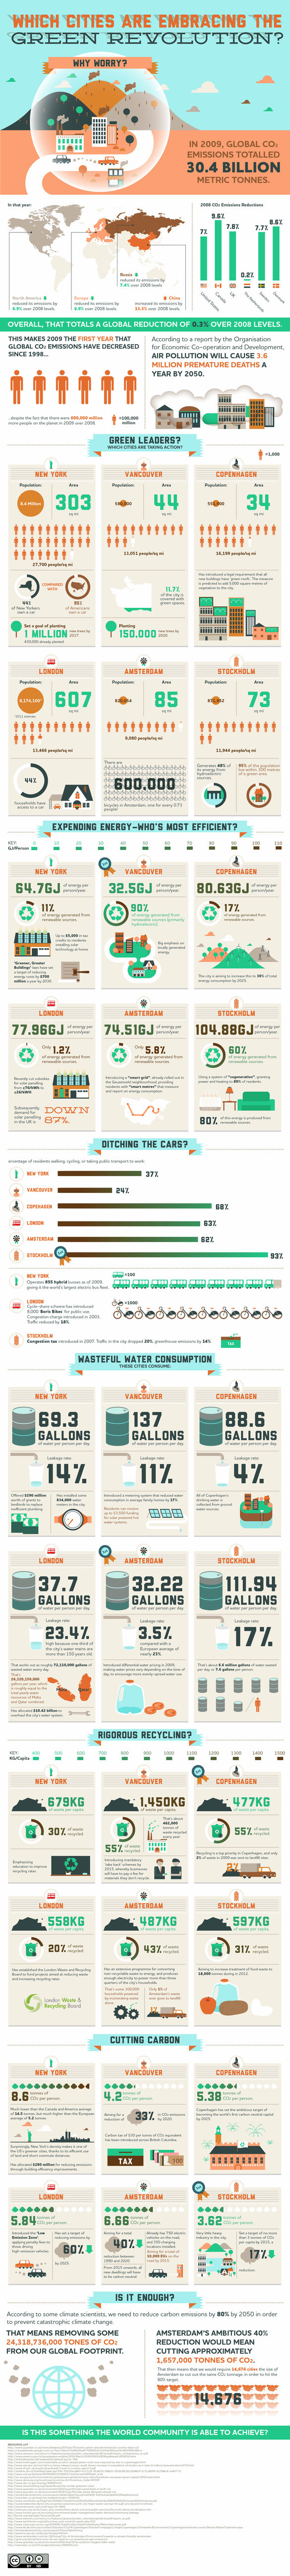 Green Building Revolution Infographic